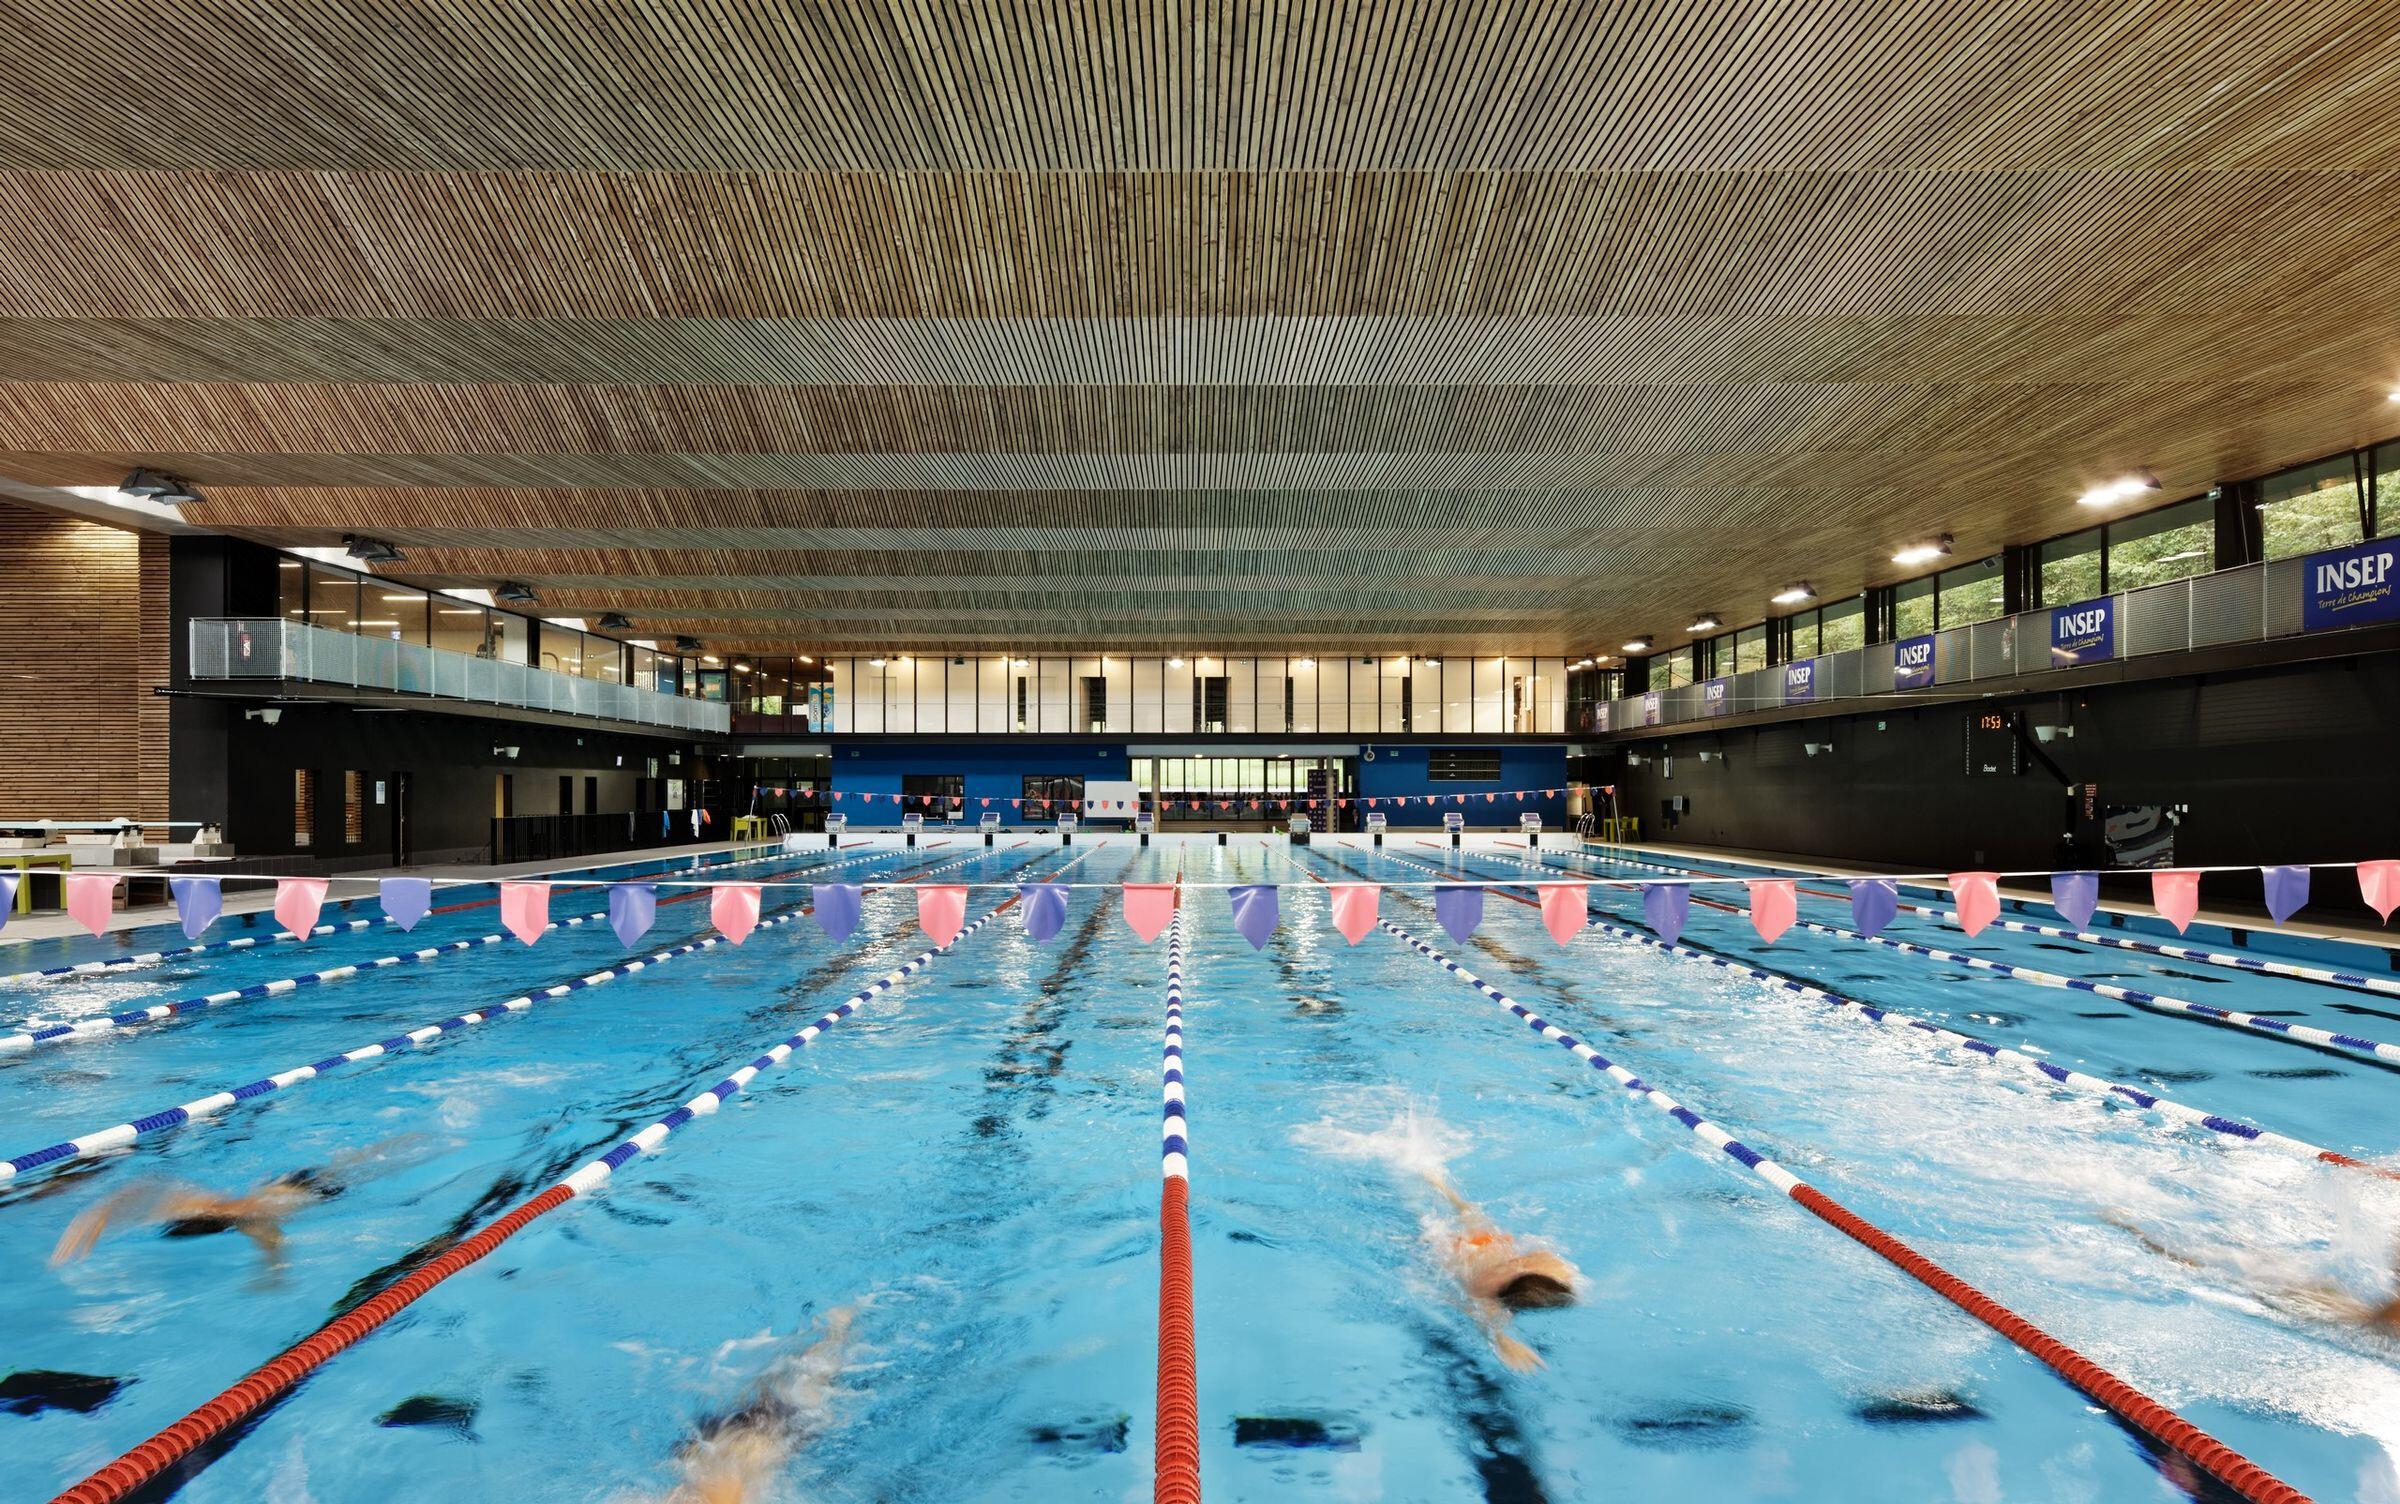 Aquatic Center Christine Caron - INSEP